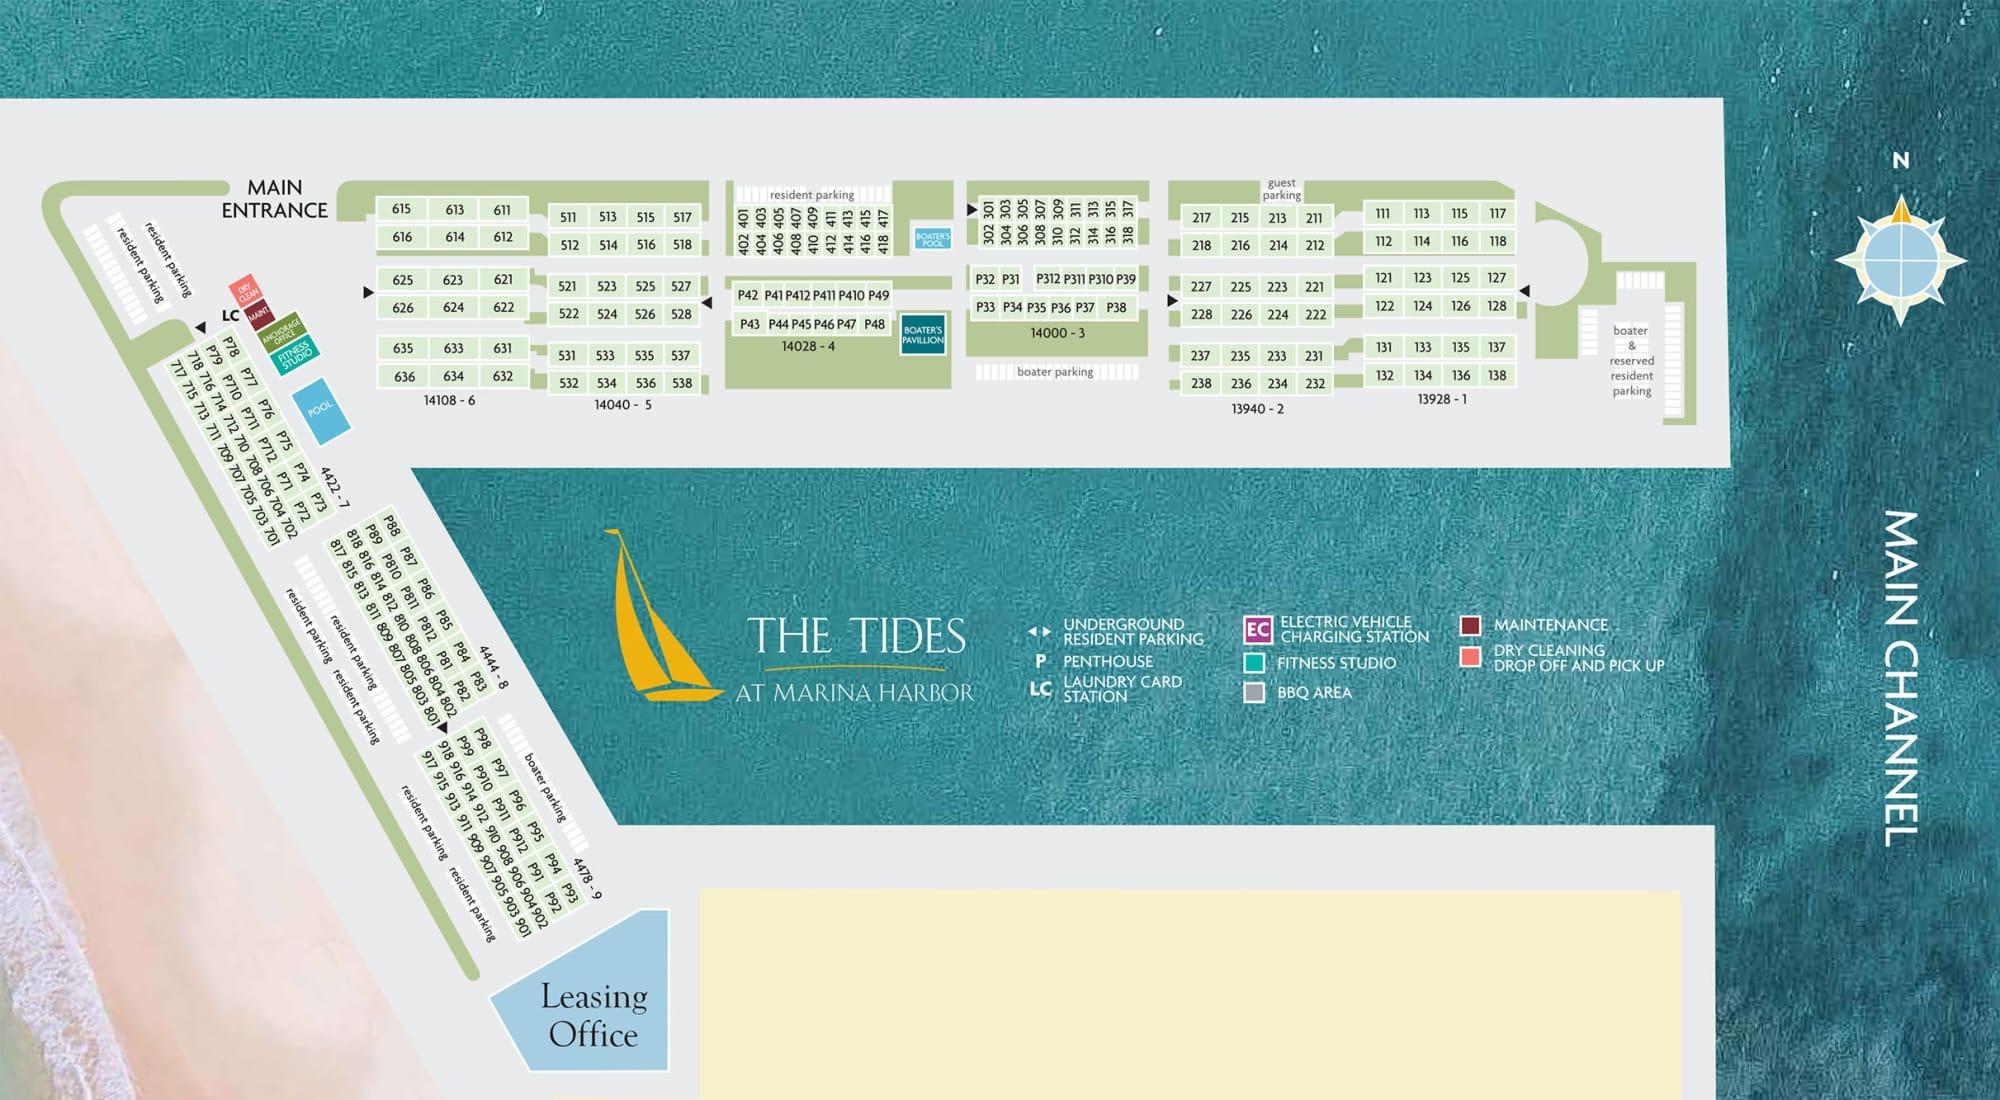 Site plan for The Tides at Marina Harbor in Marina Del Rey, California